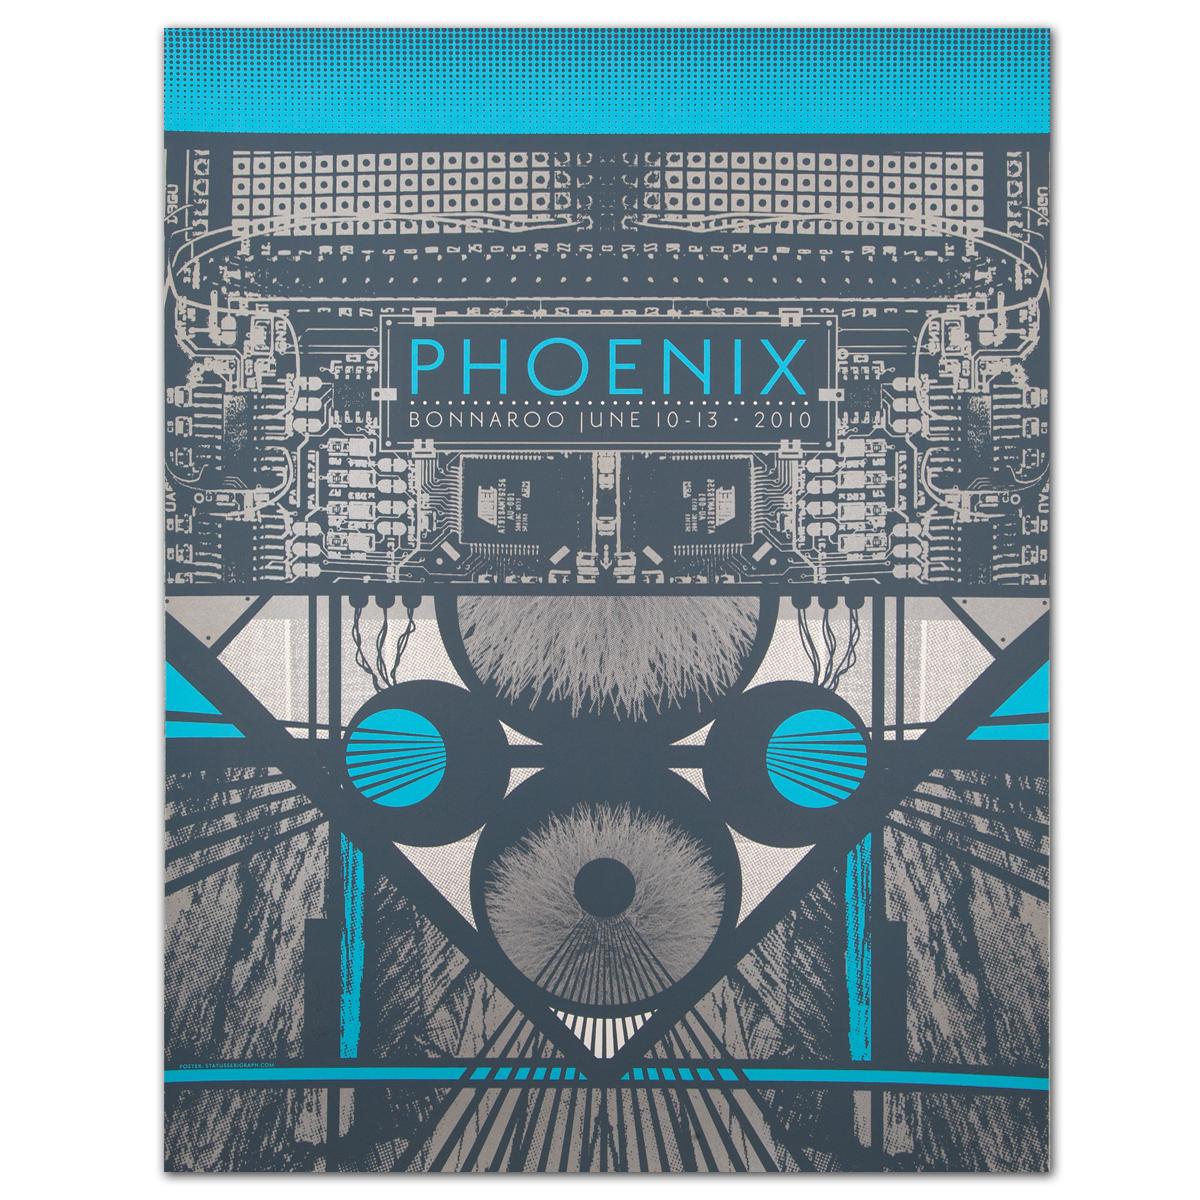 Bonnaroo 2010 Phoenix Poster